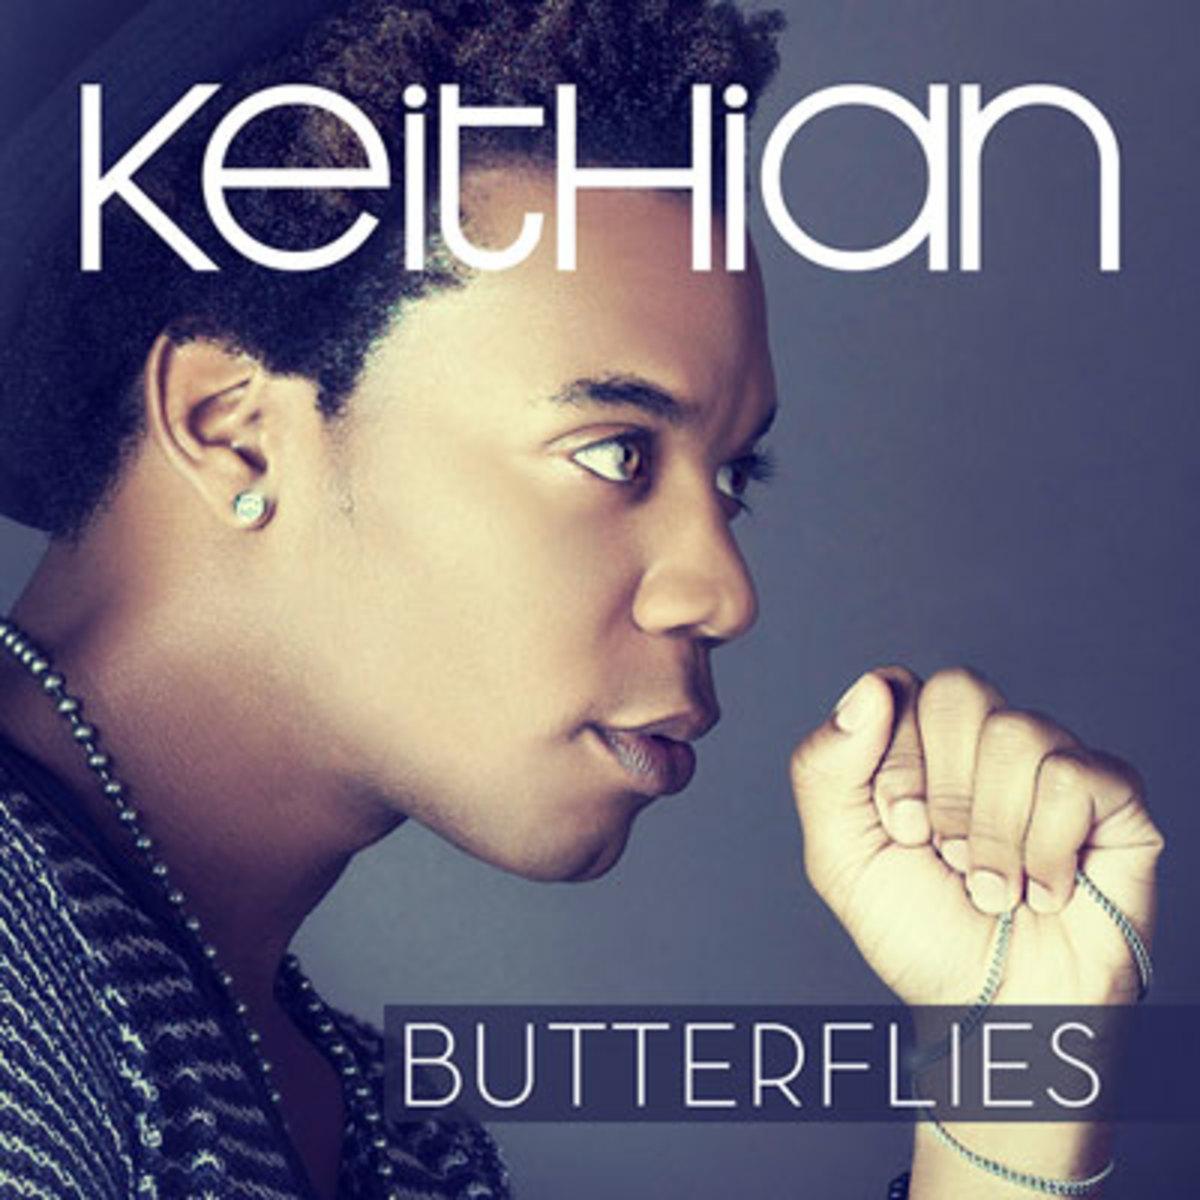 keithian-butterflies.jpg